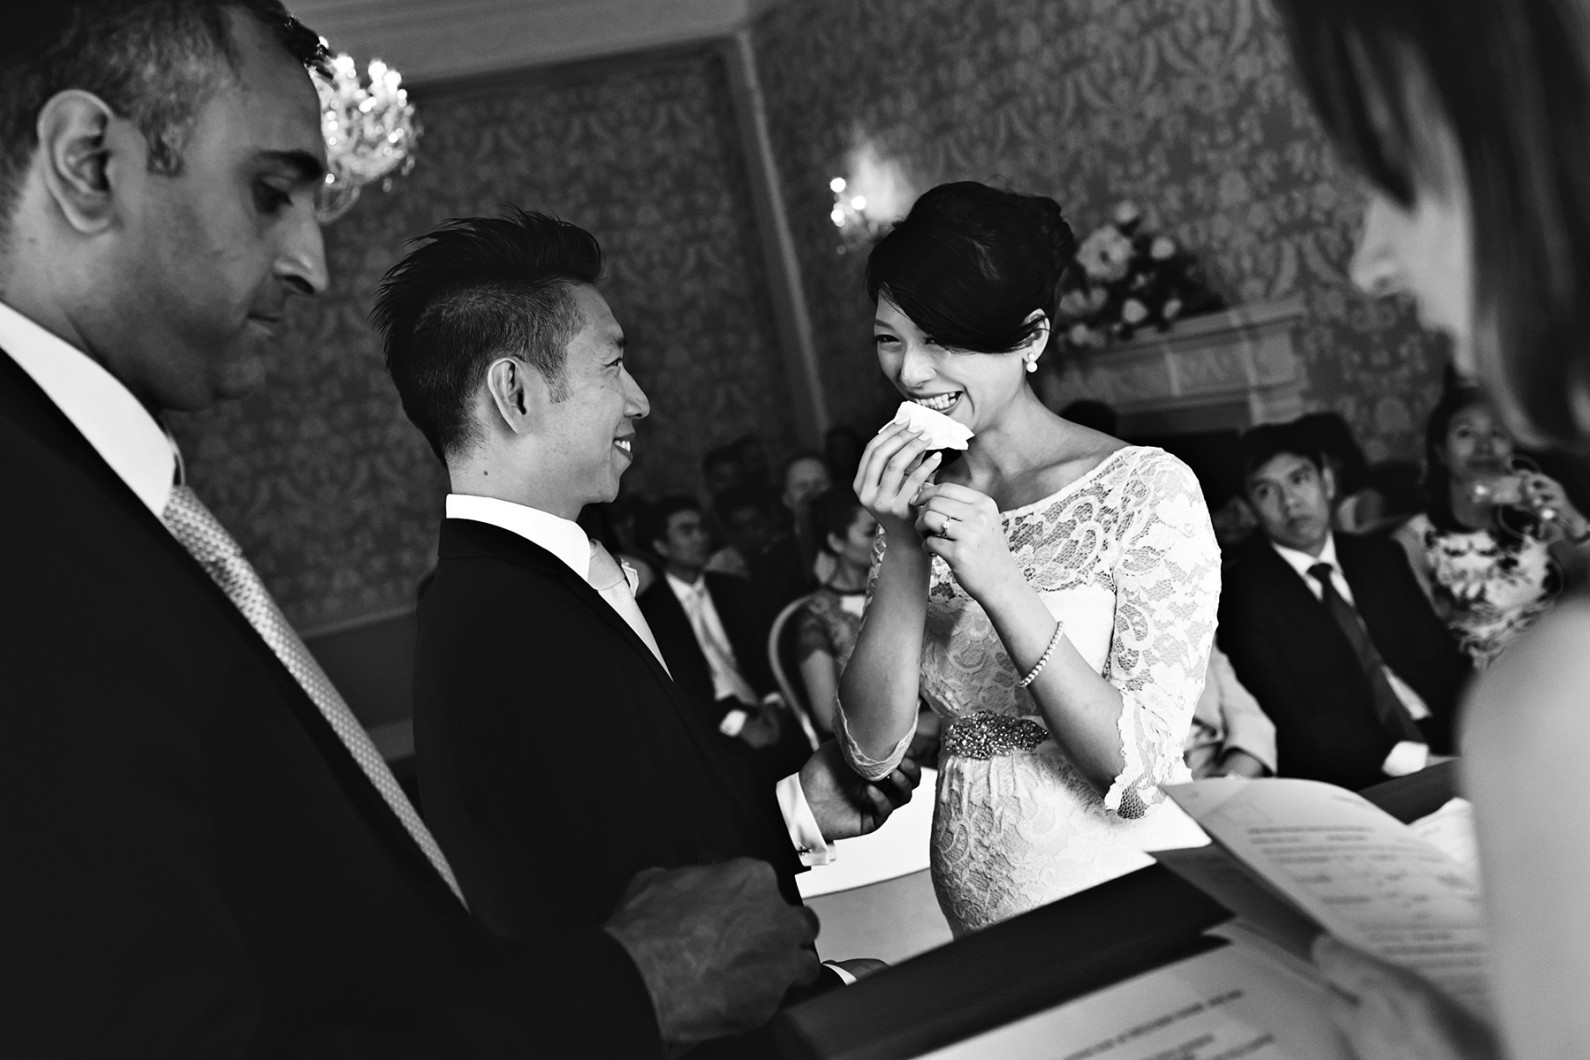 asian-photographer-uk-wedding-skin-black-dude